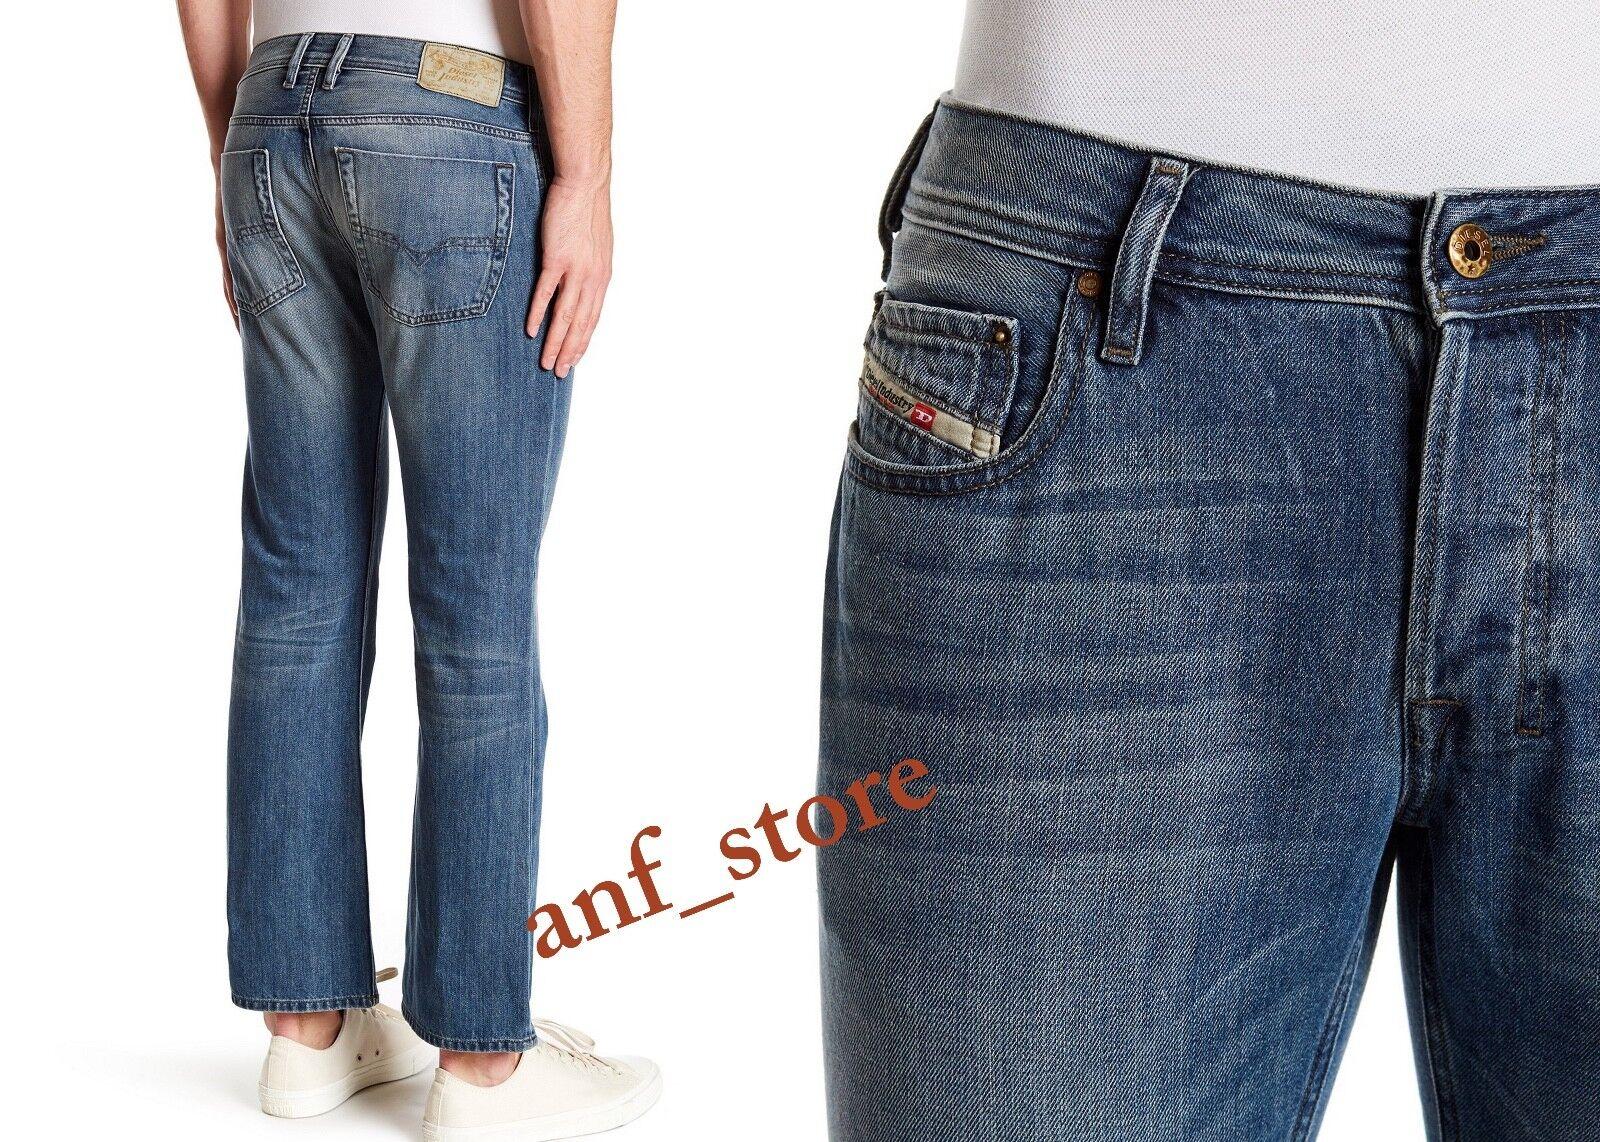 NWT Diesel ZATINY 0RZ38 FADED Bootcut Leg Men Jeans 34 x 30 Safado